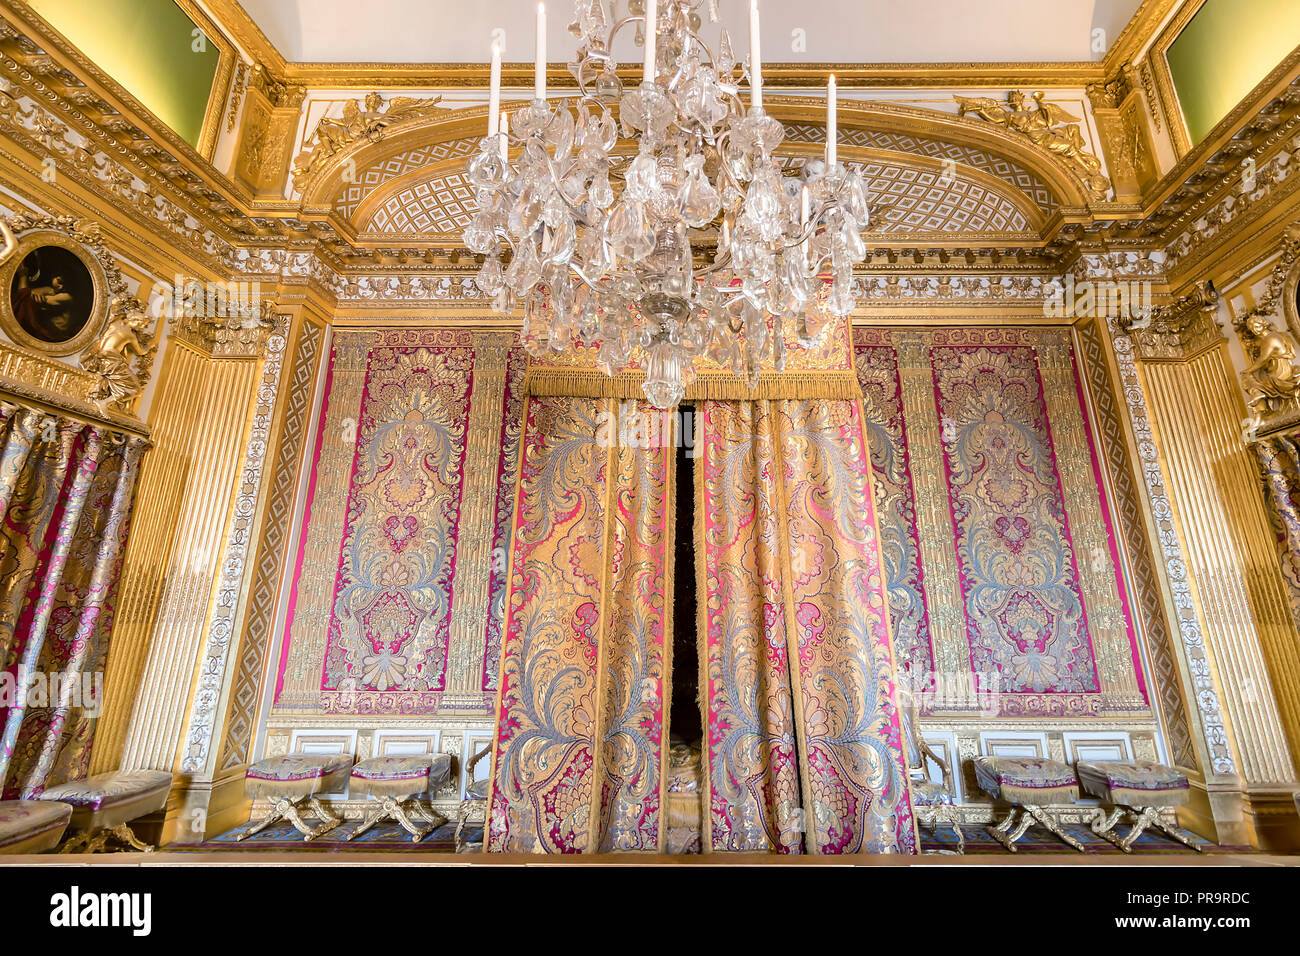 Bedroom of louis xiv immagini bedroom of louis xiv fotos stock alamy - Camera da letto del papa ...